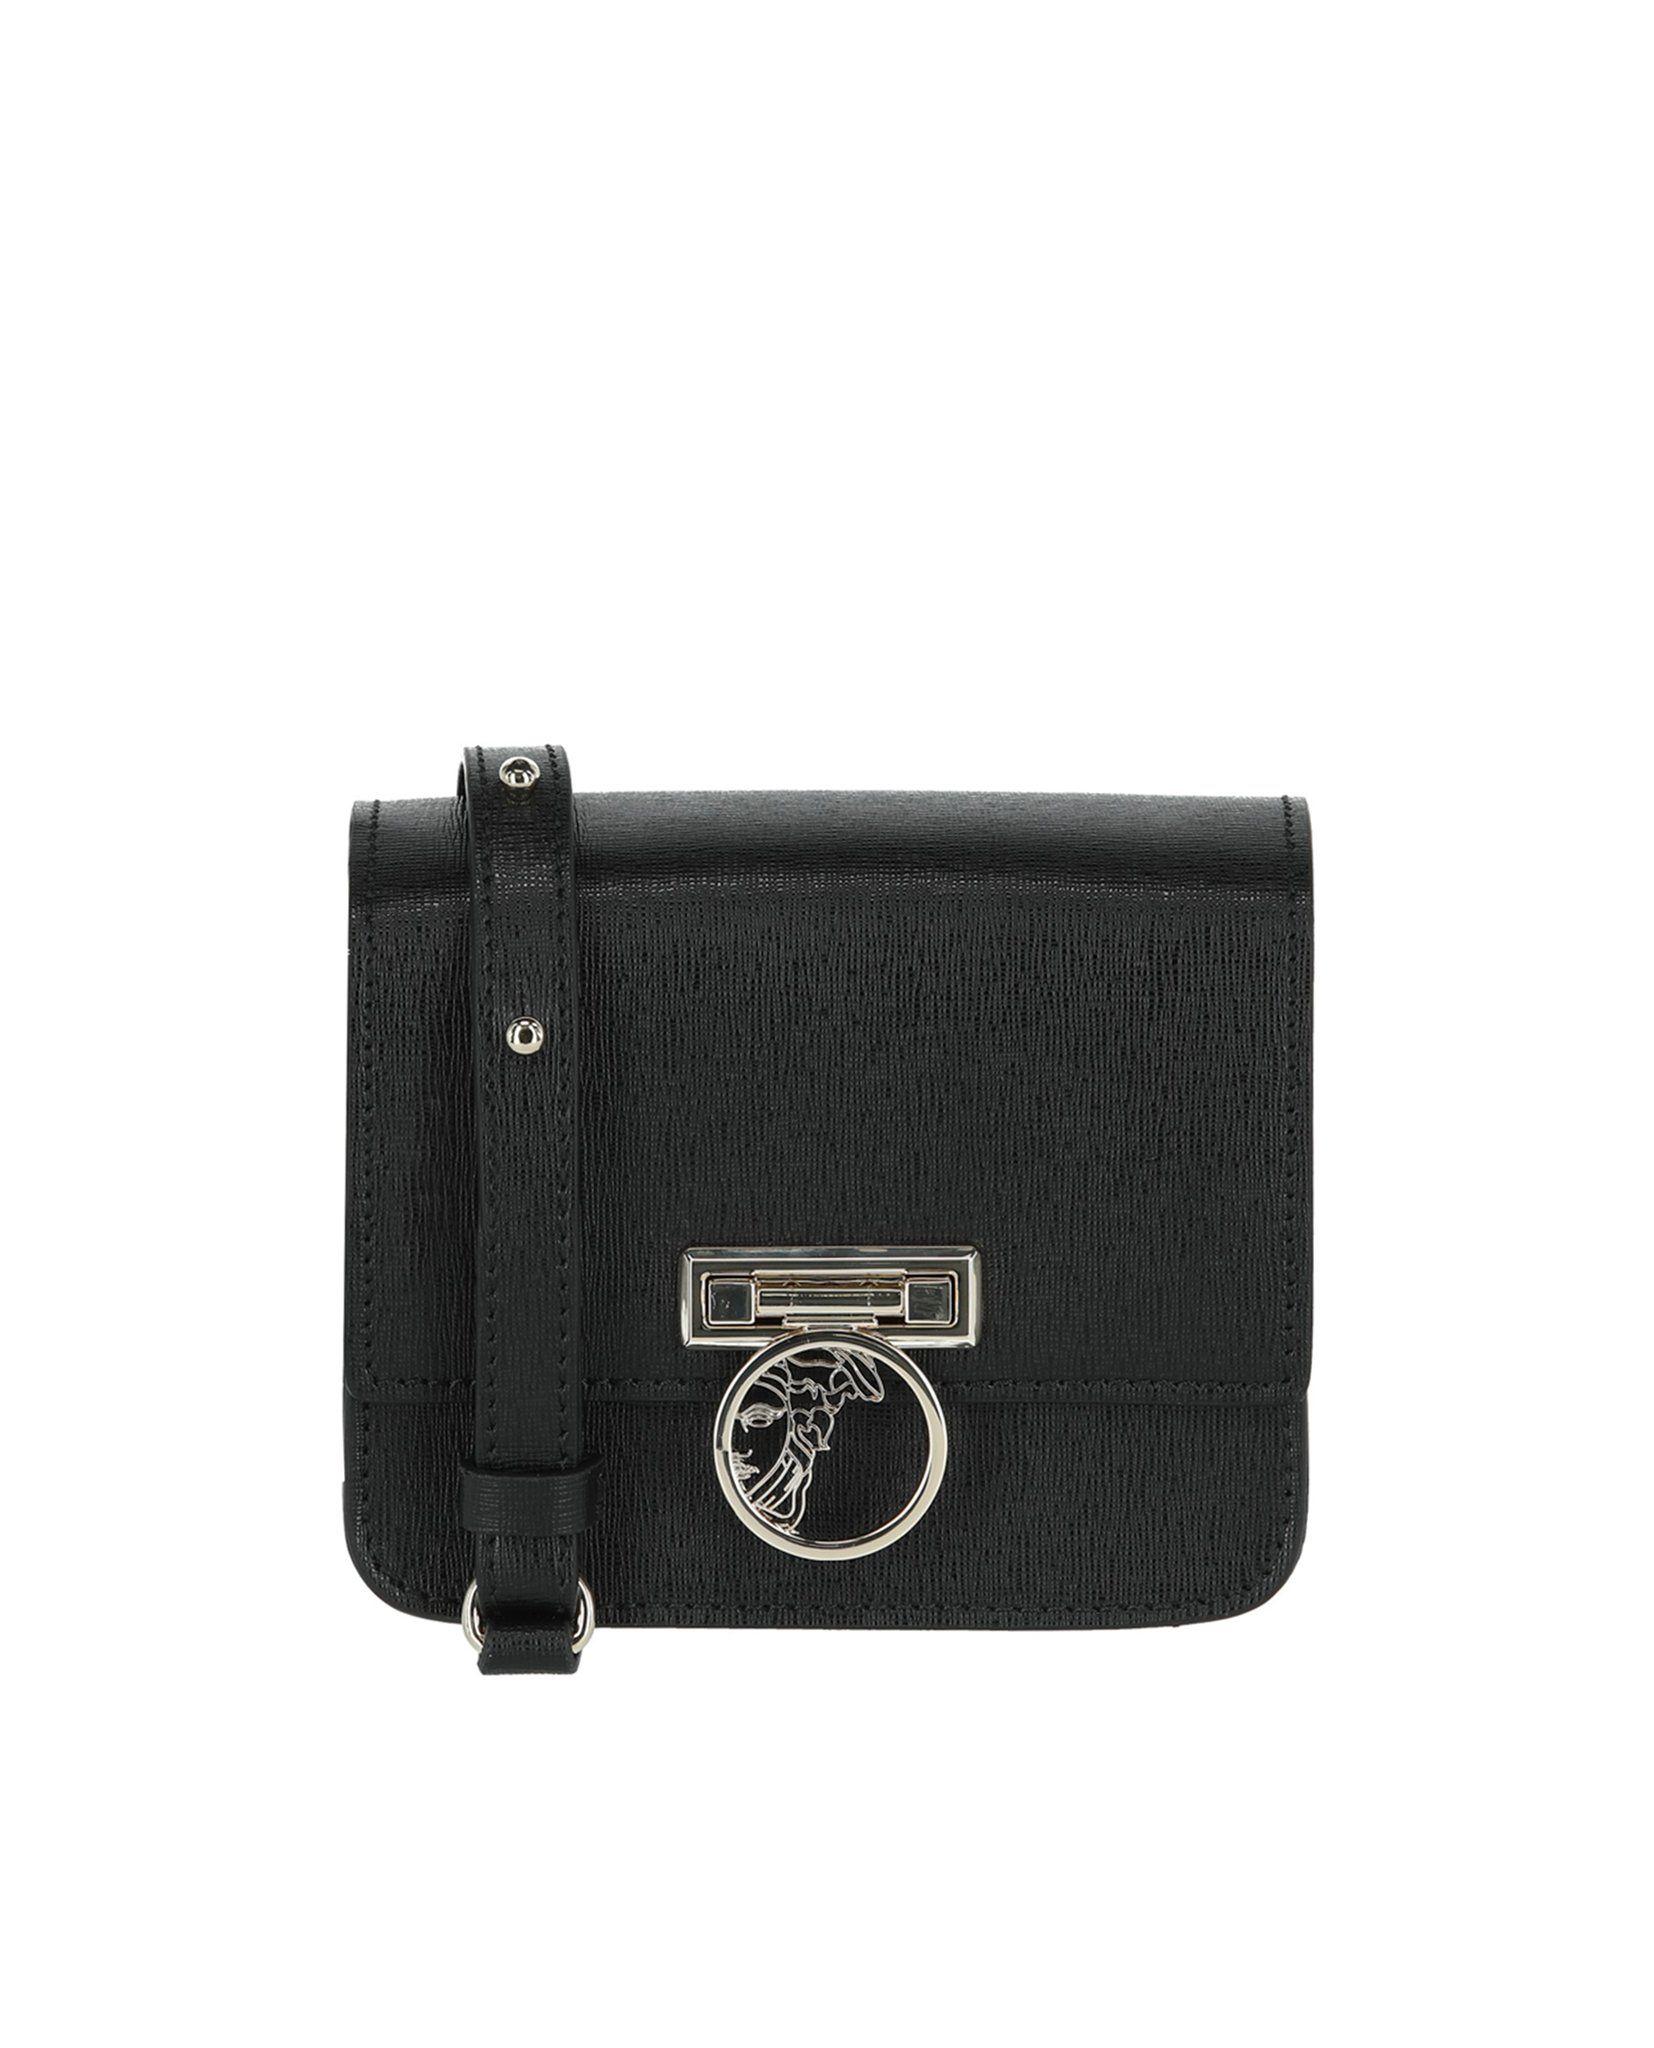 Versace Collection Crossbody Handbag  91029dee6b7b8